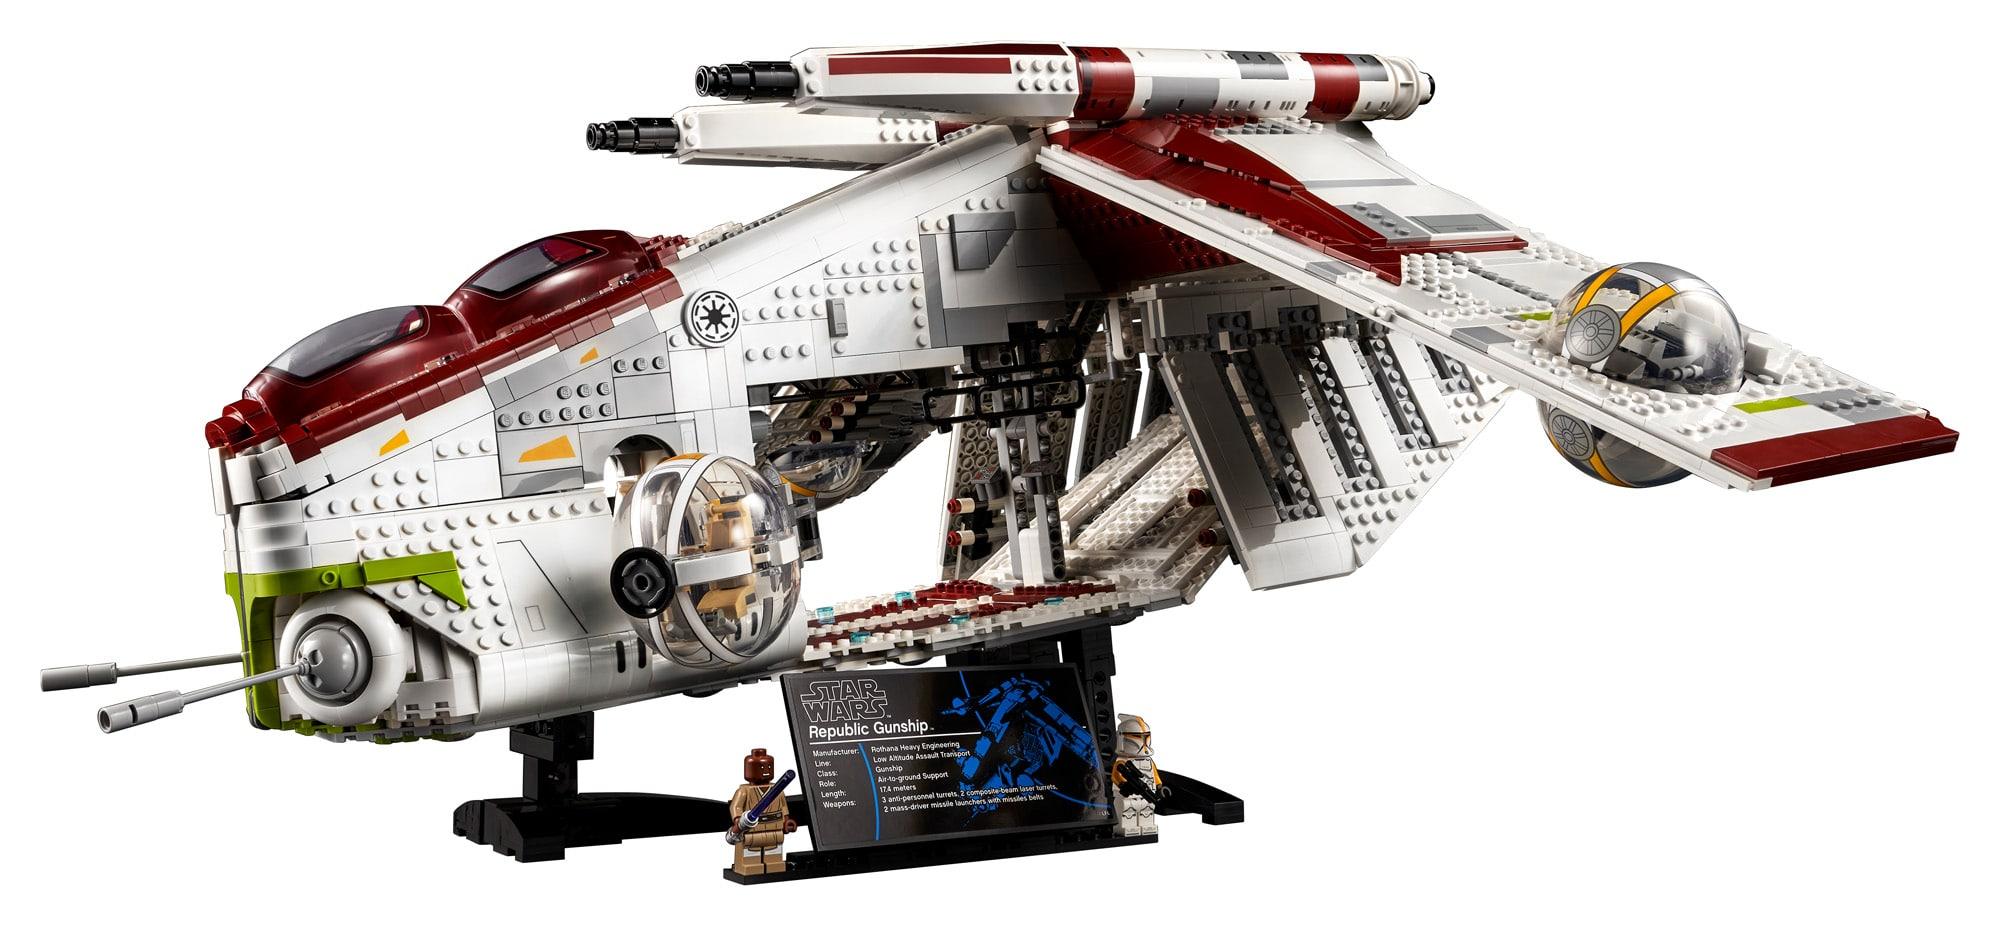 LEGO Star Wars 75309 Ucs Republic Gunship 6